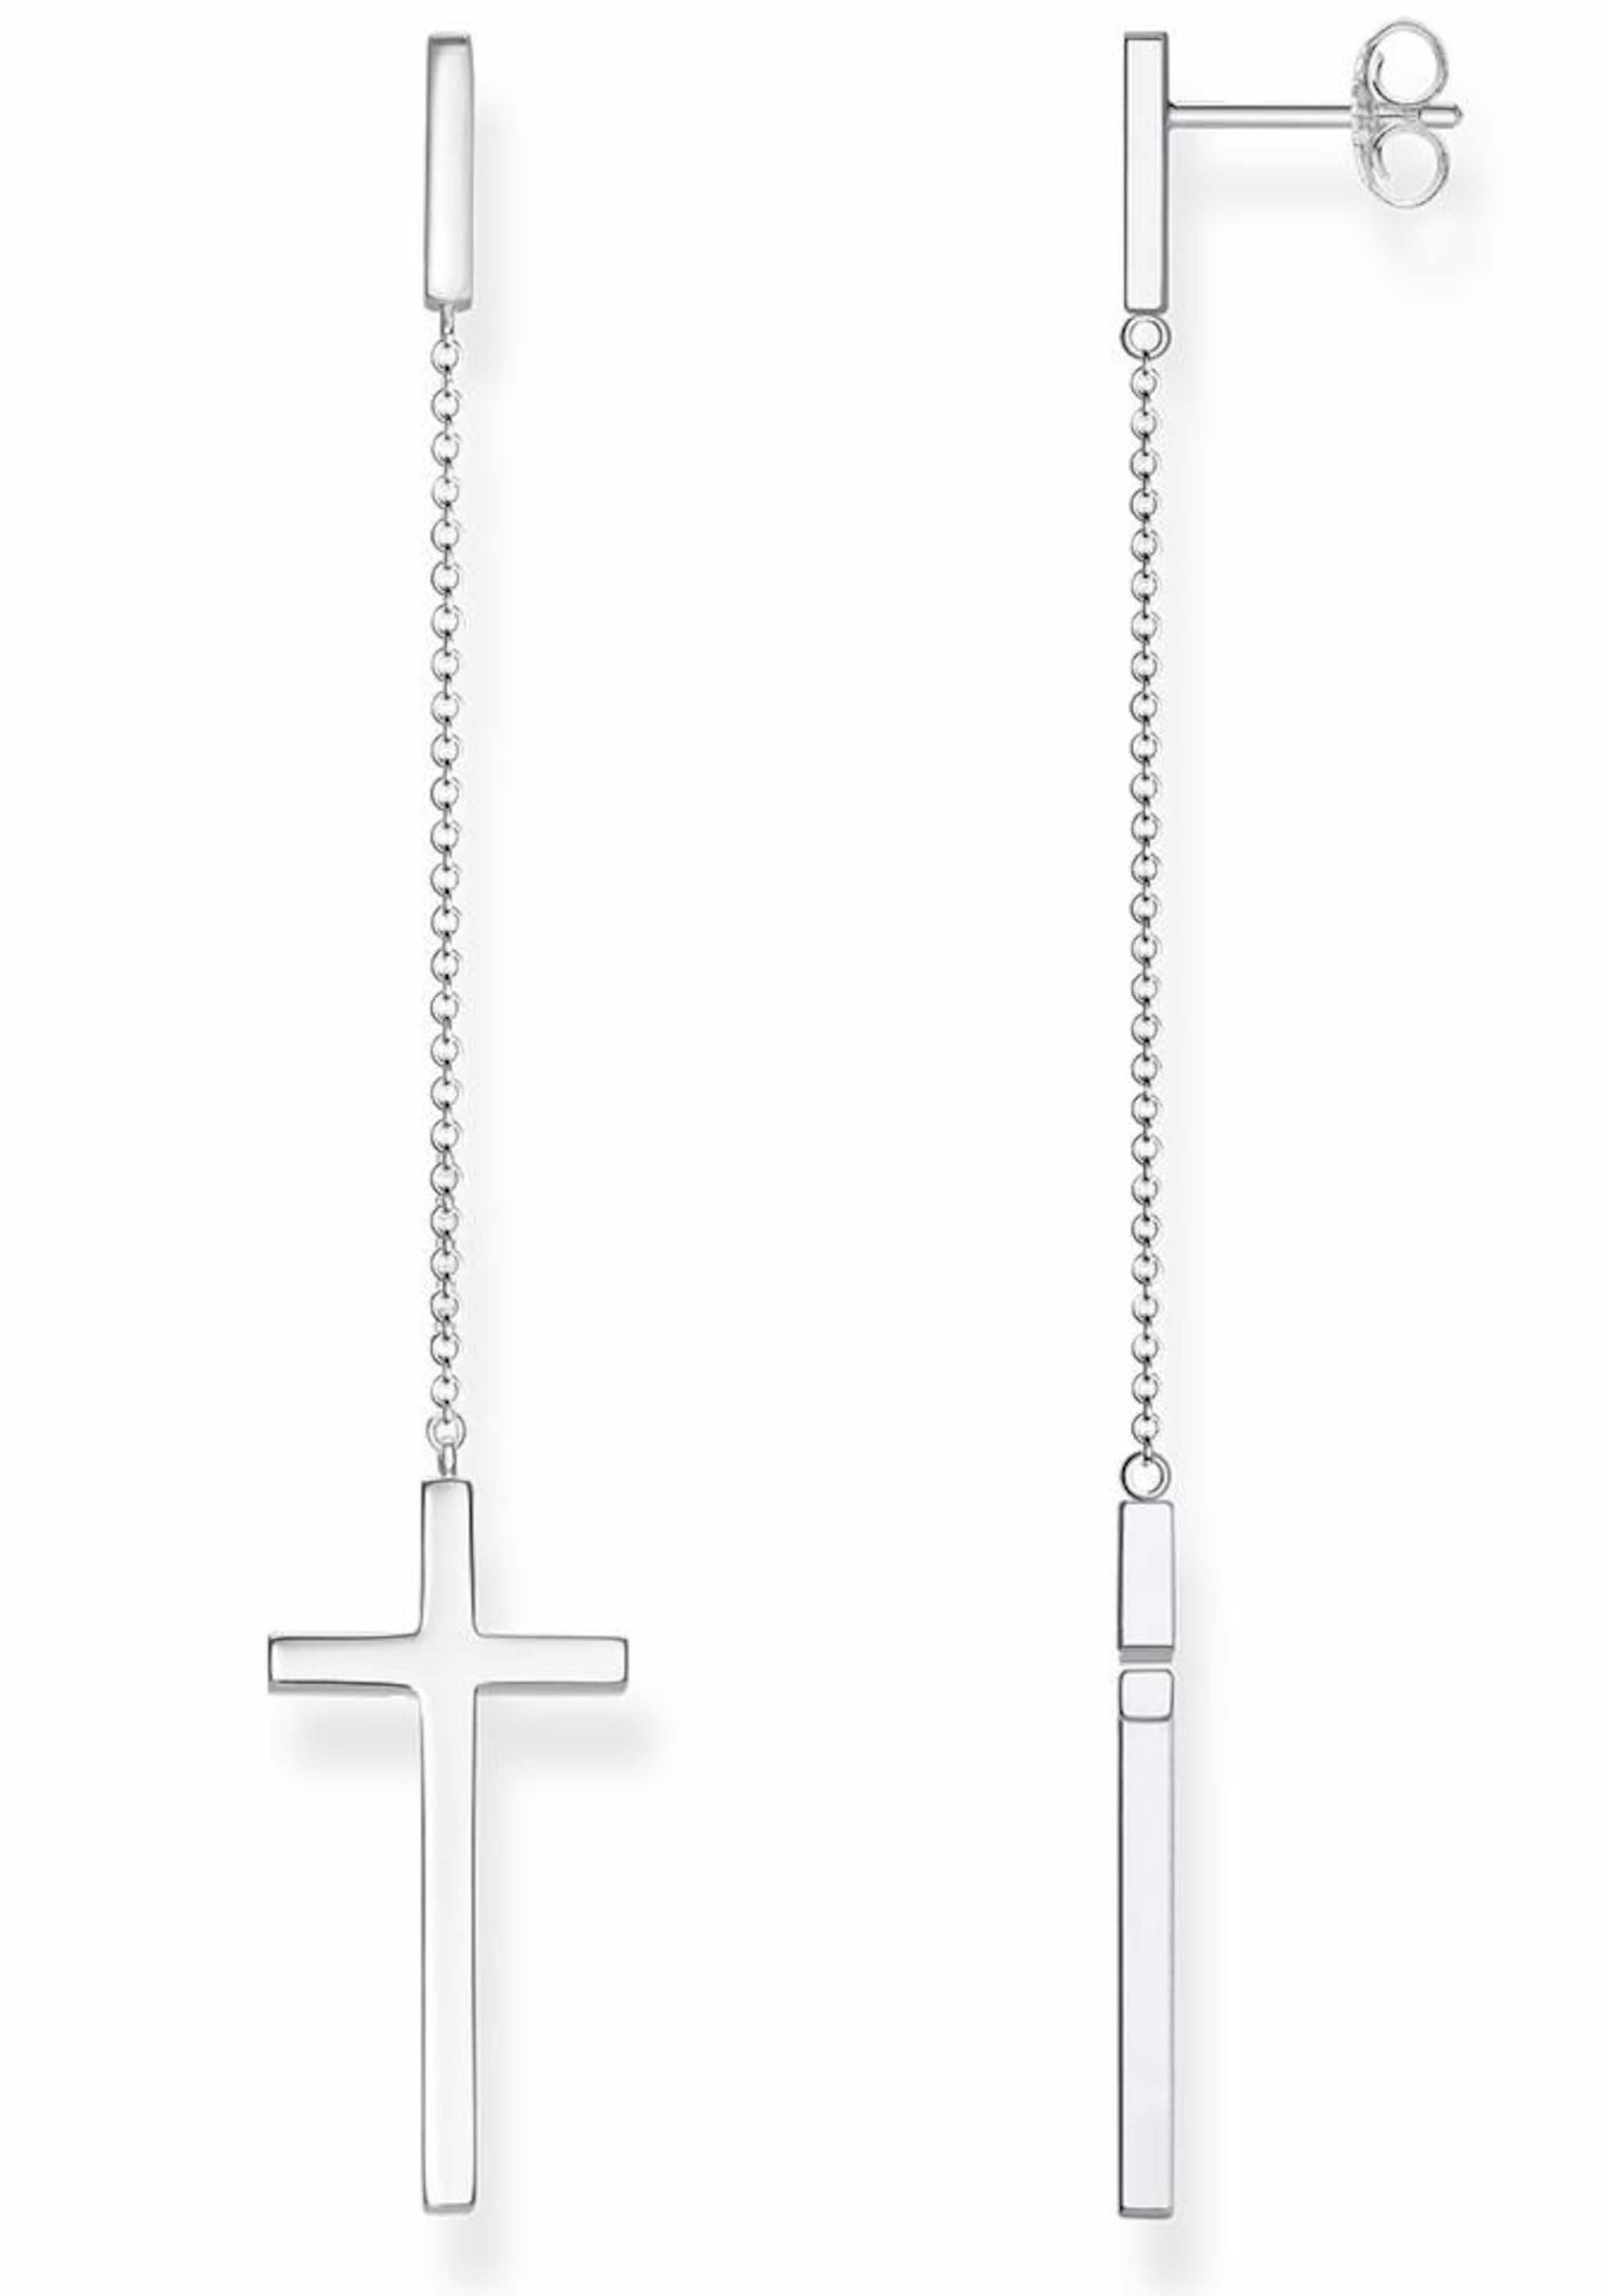 Paar Thomas Ohrstecker 12' Silber 'kreuzeH1949 In Sabo 001 E2IDH9